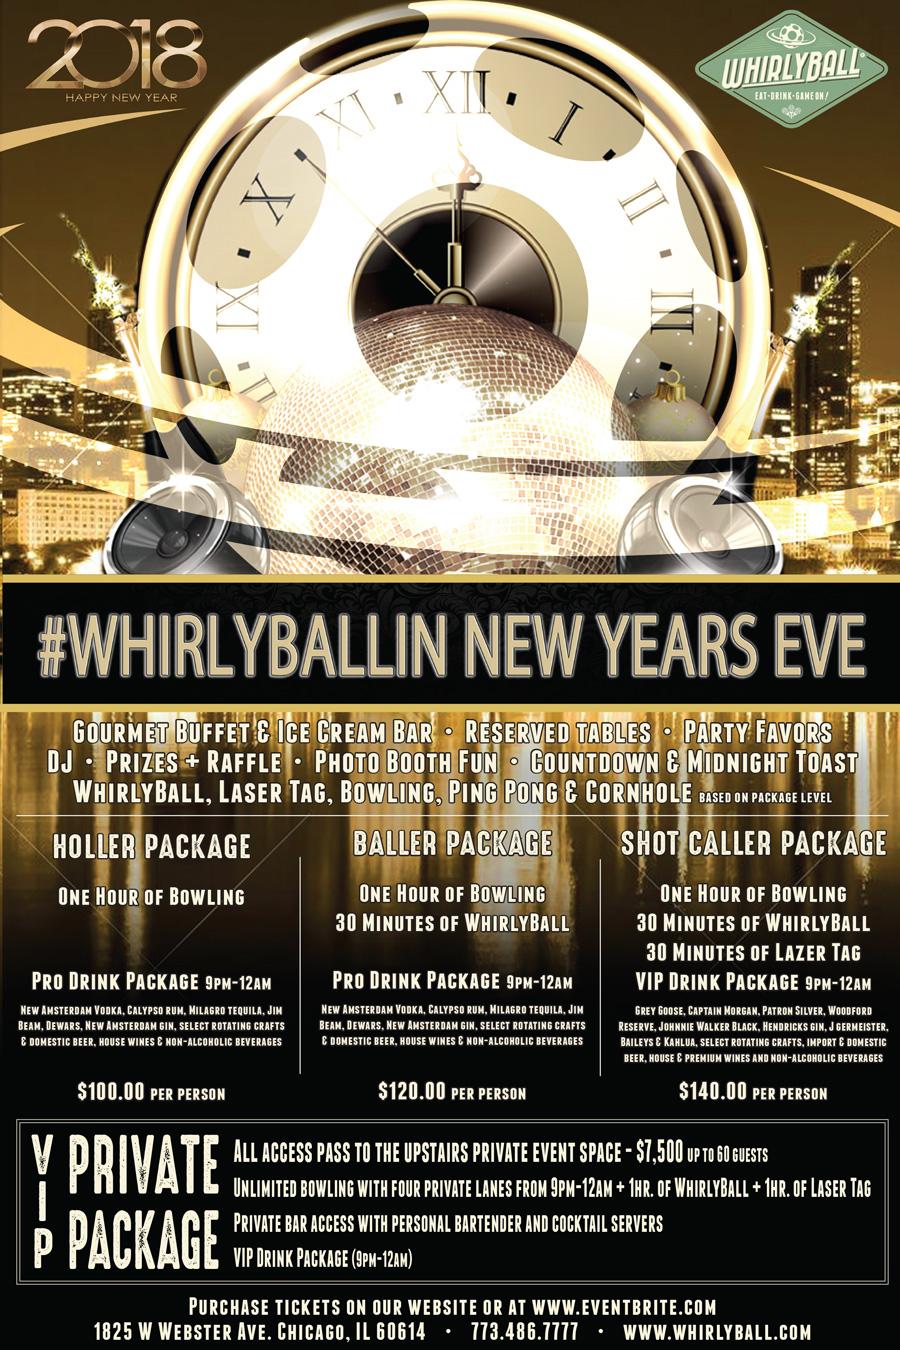 #WhirlyBallin' NYE 2018